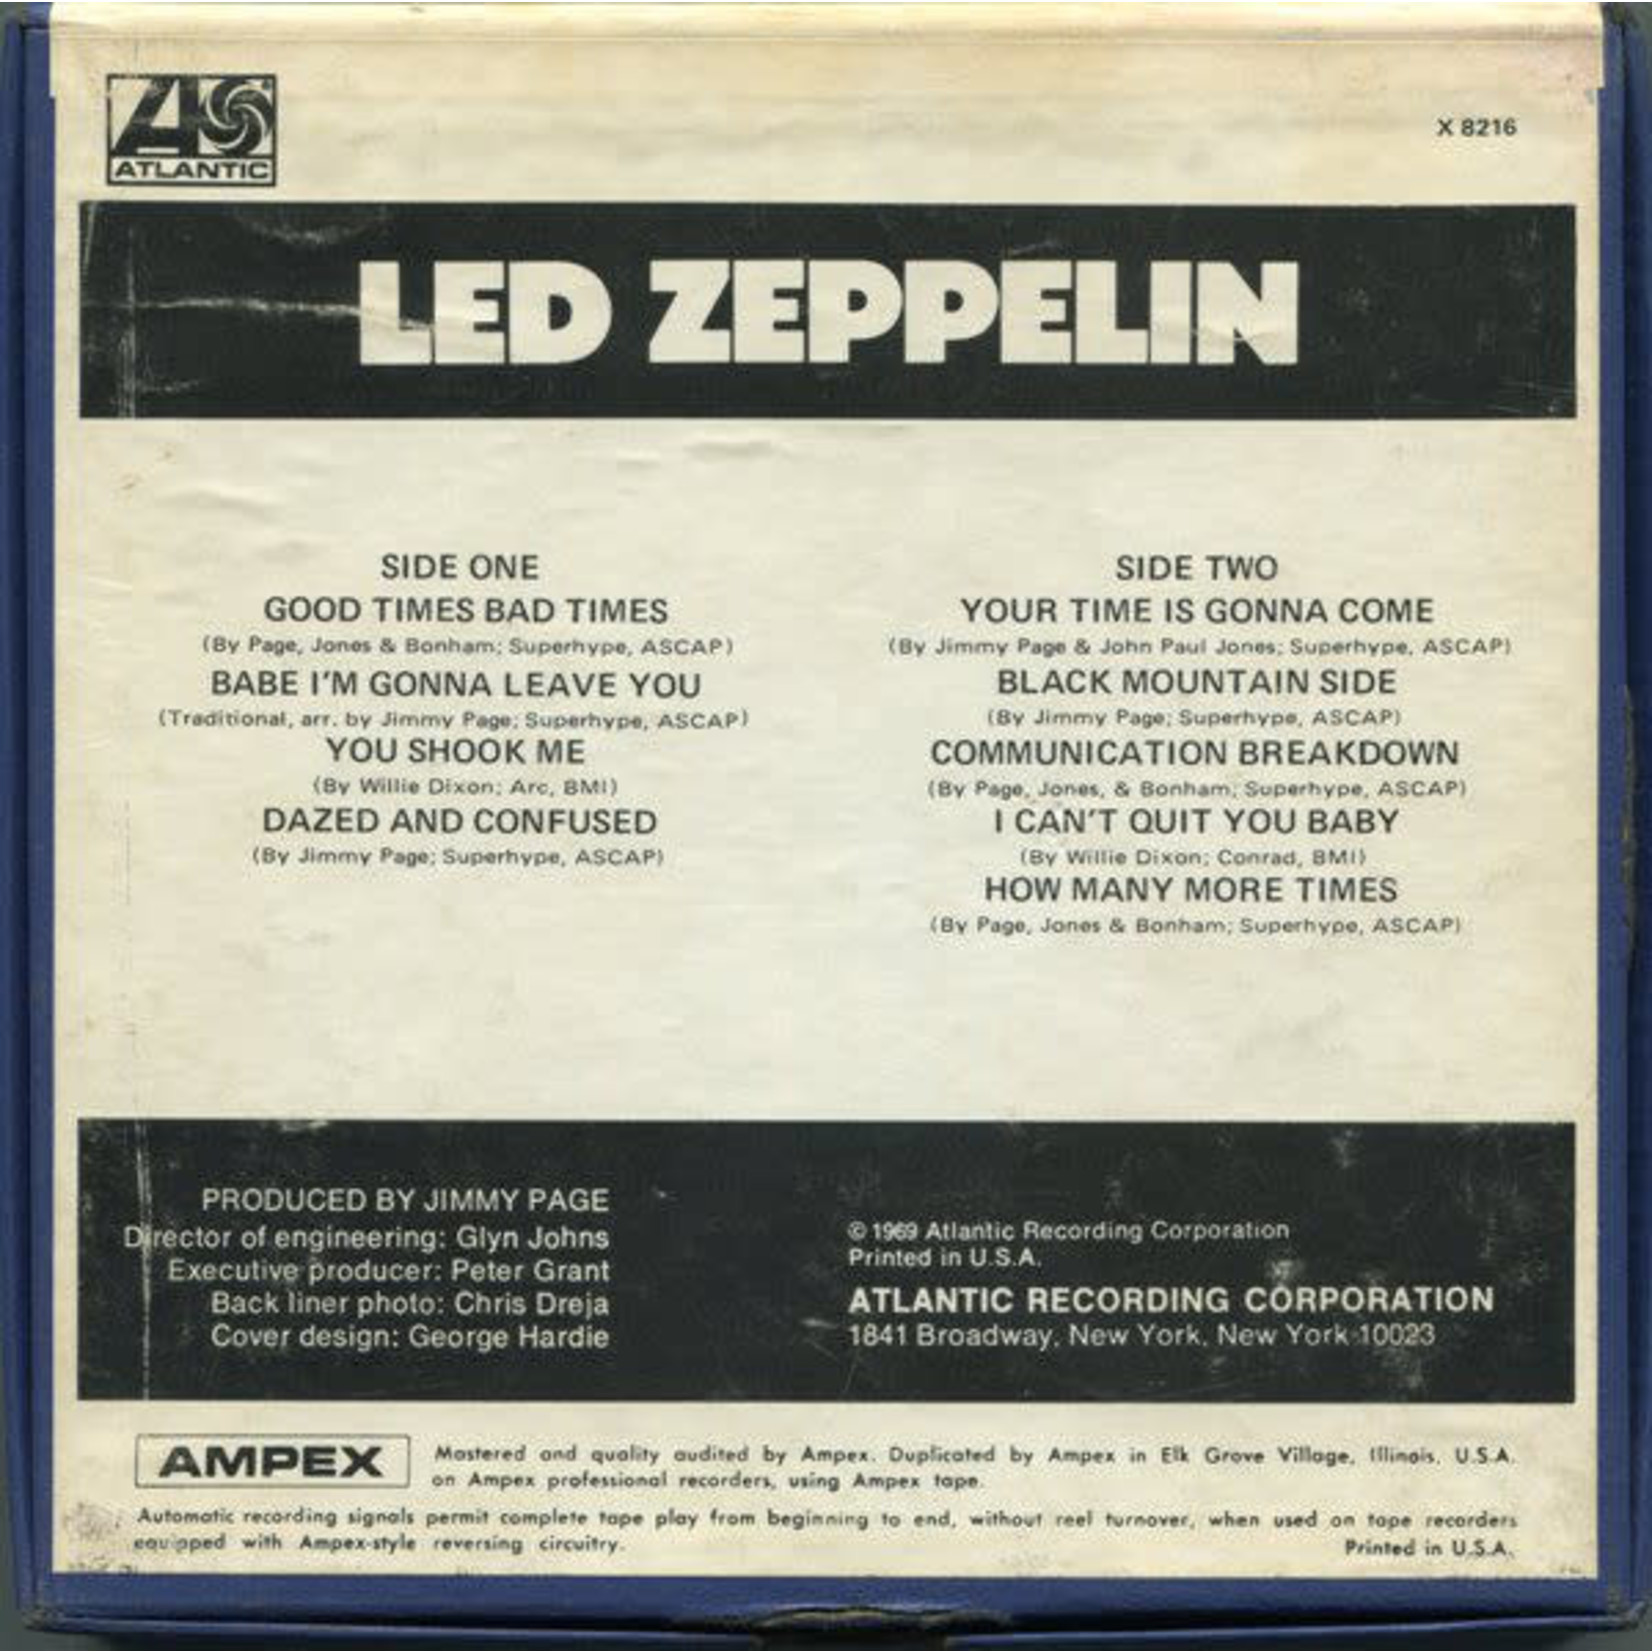 Accessory Led Zeppelin - I, II, III   [Reel to Reel Collection]